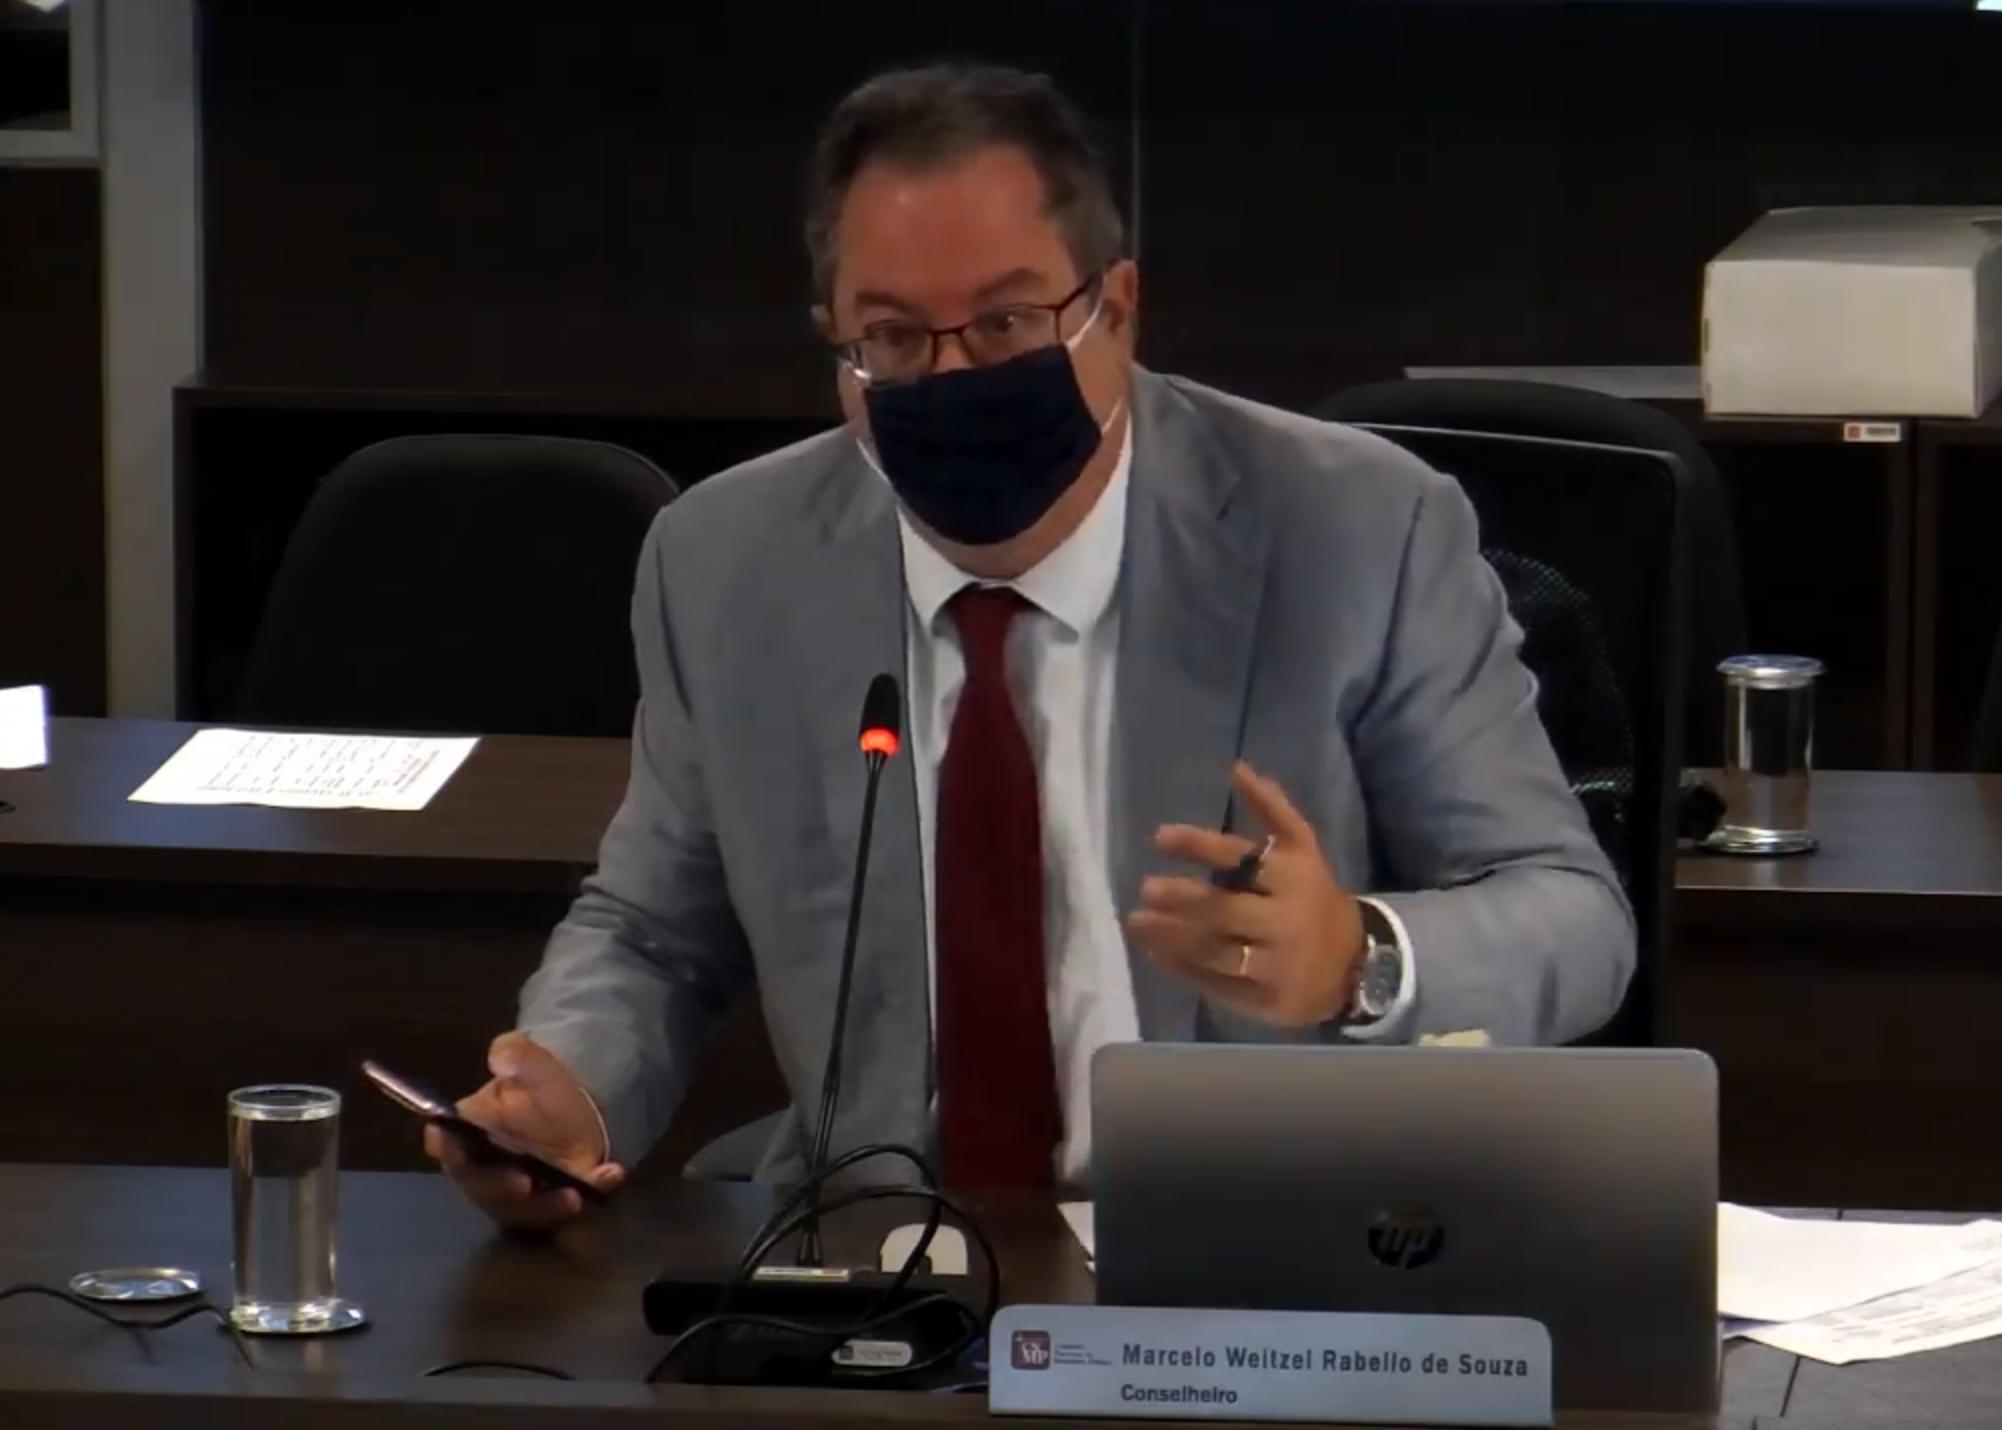 Conselheiro Marcelo Weitzel